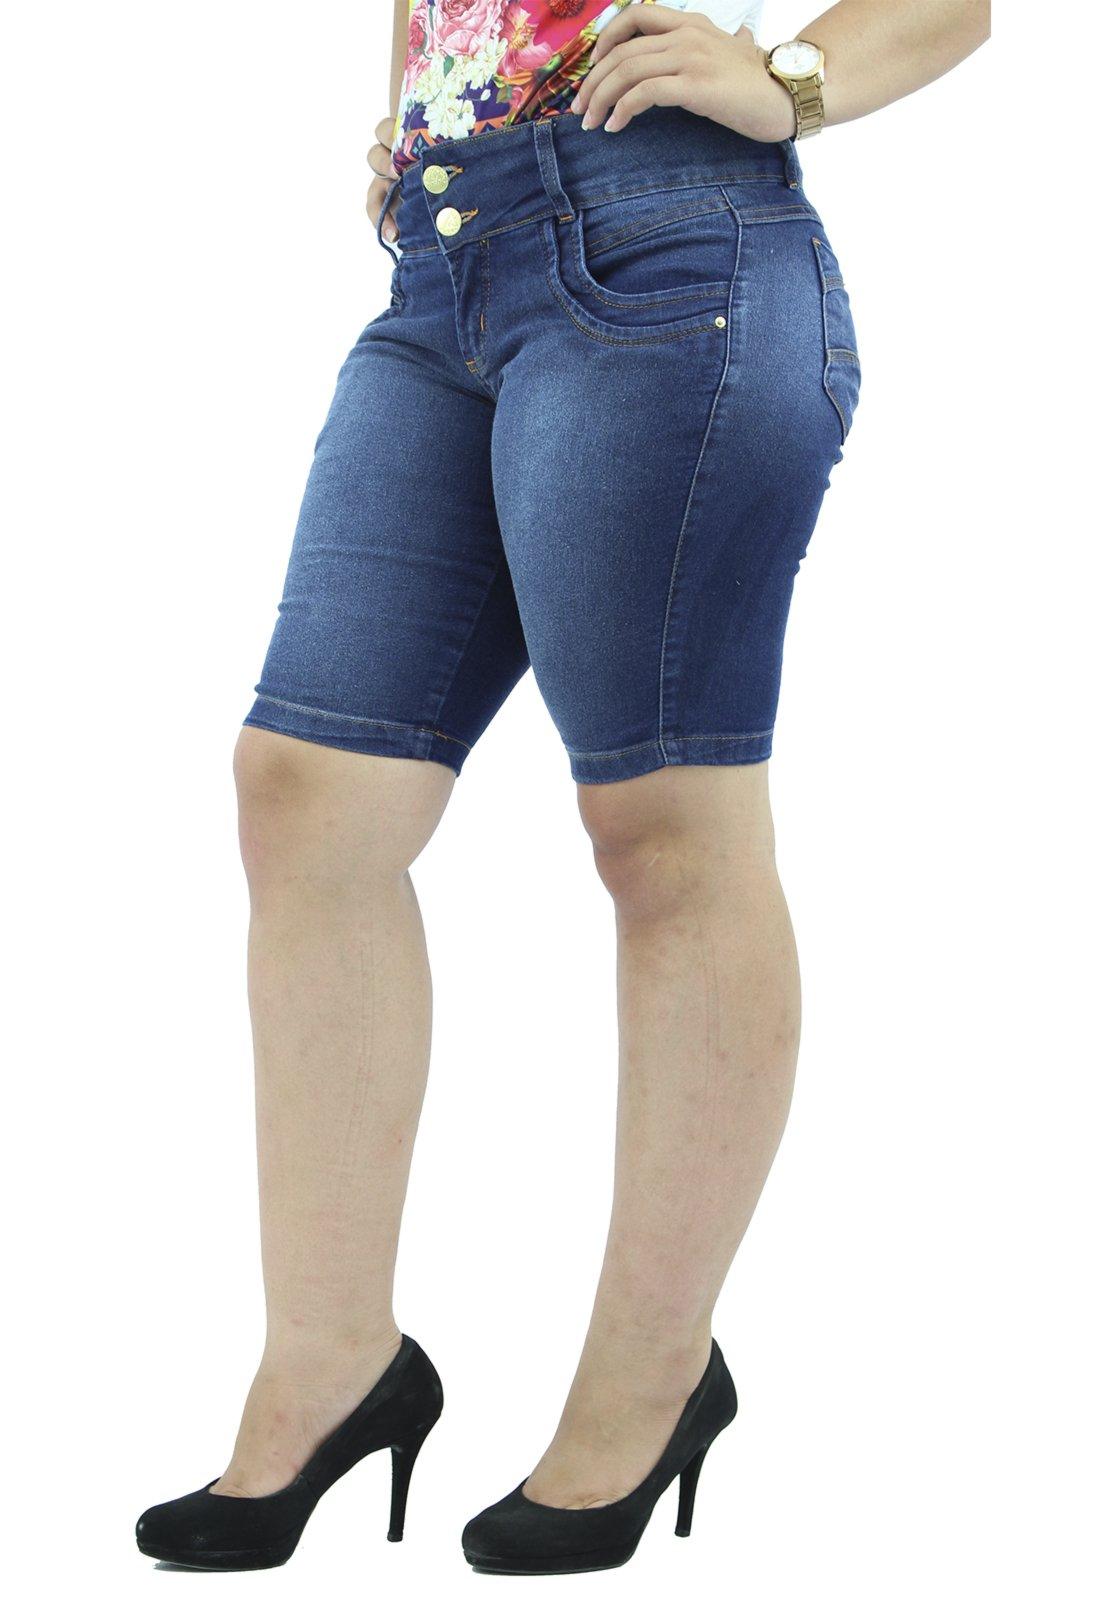 Bermuda   Média Jeans Anagrom Azul Destroyer - Marca Anagrom